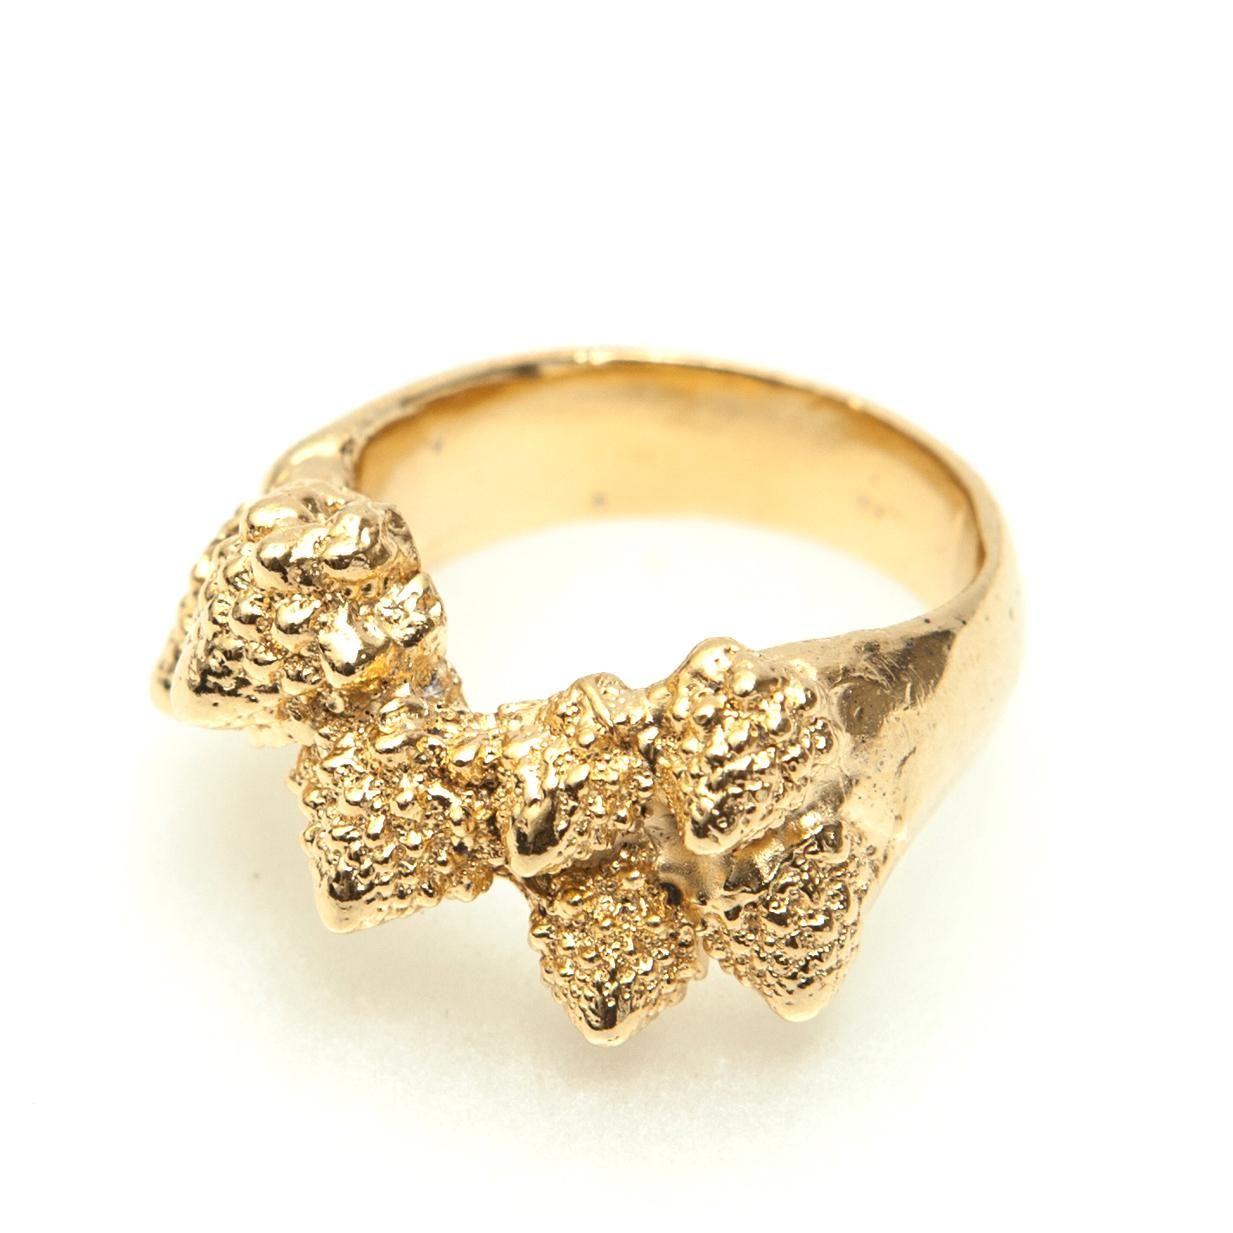 Romanesco Broccoli Ring on AHAlife